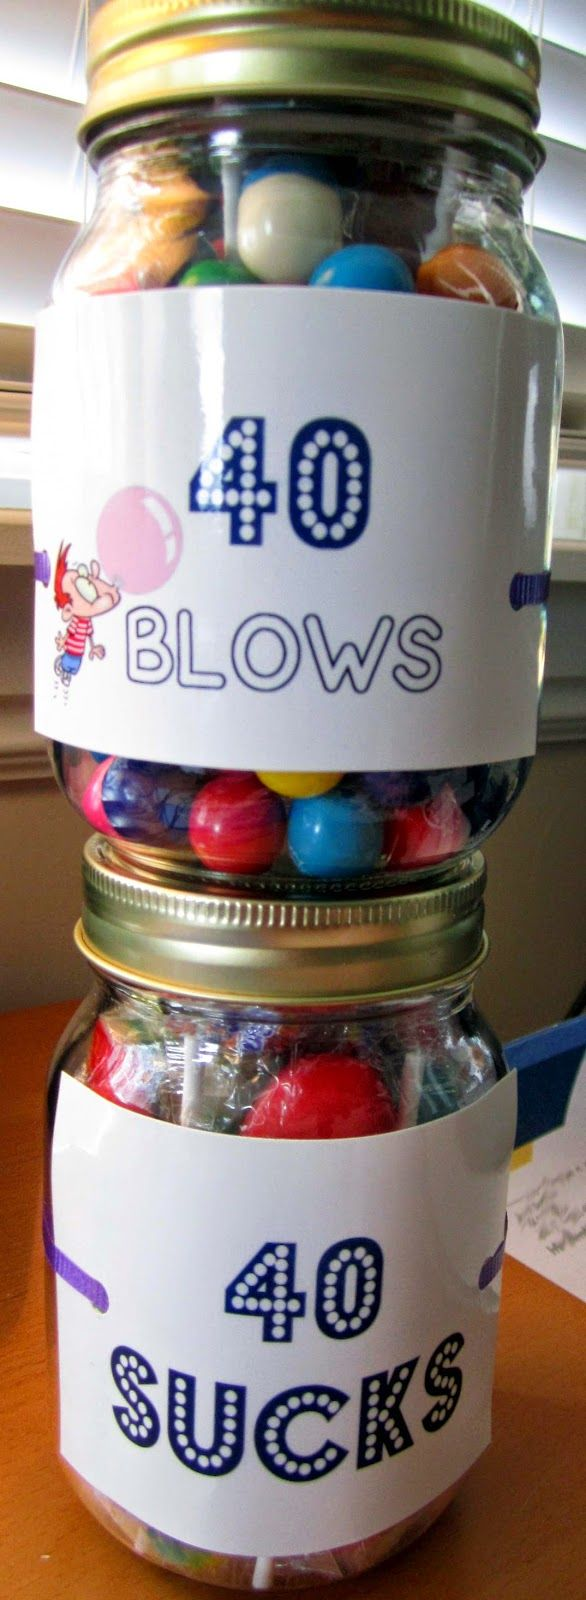 The Big 4-0! 40 Blows & 40 Sucks. Cute 40th birthday gifts! #40thbirthday #40th